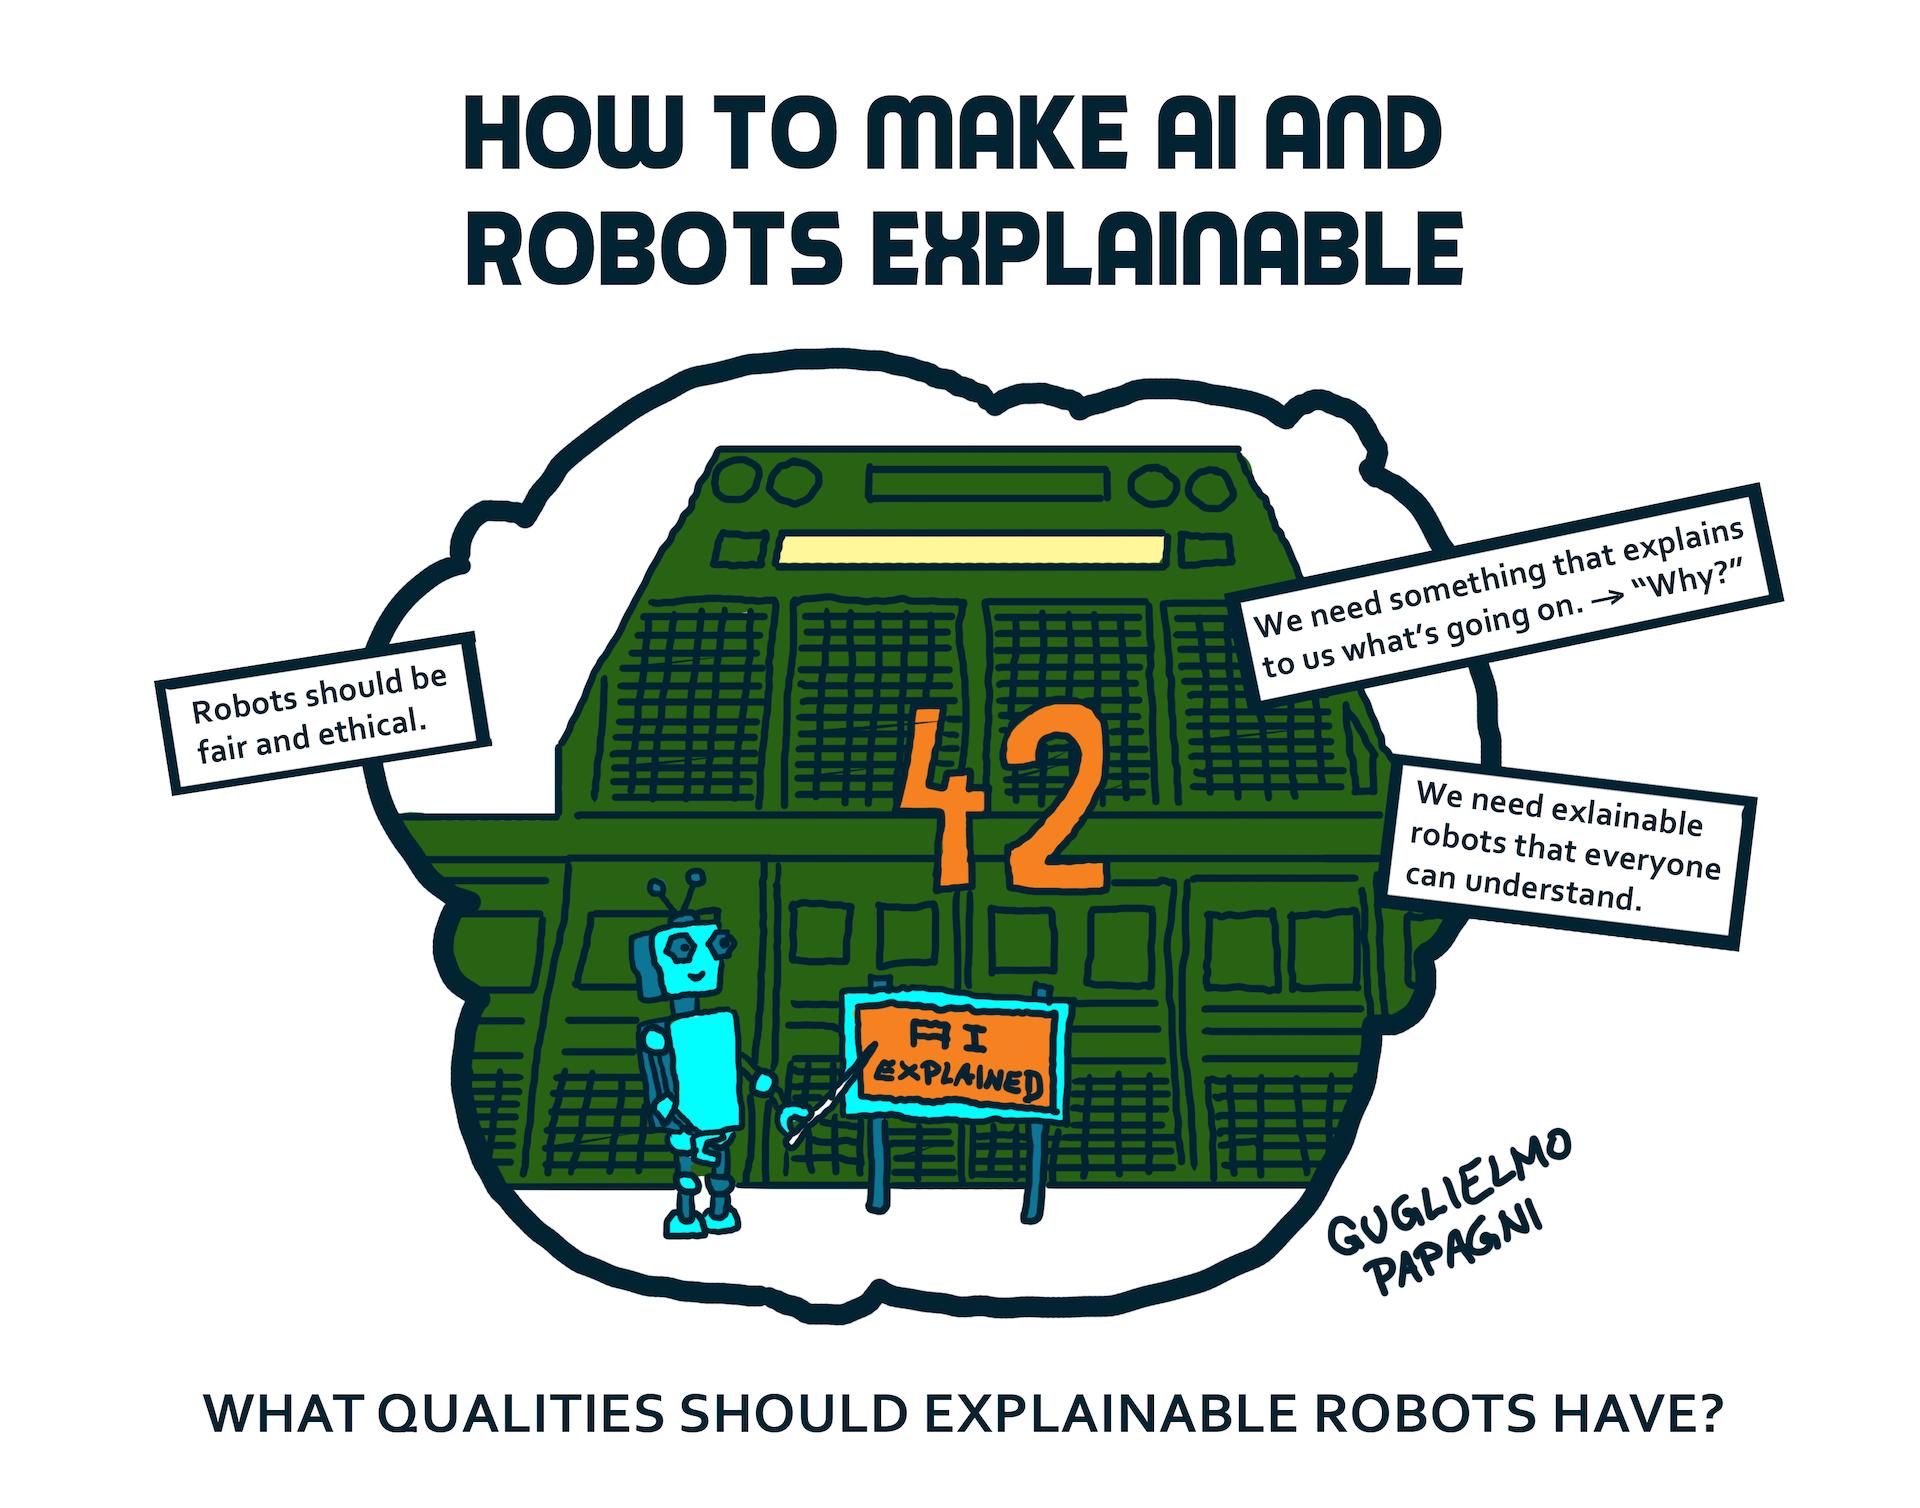 PAPAGNIexplainable Robots v2